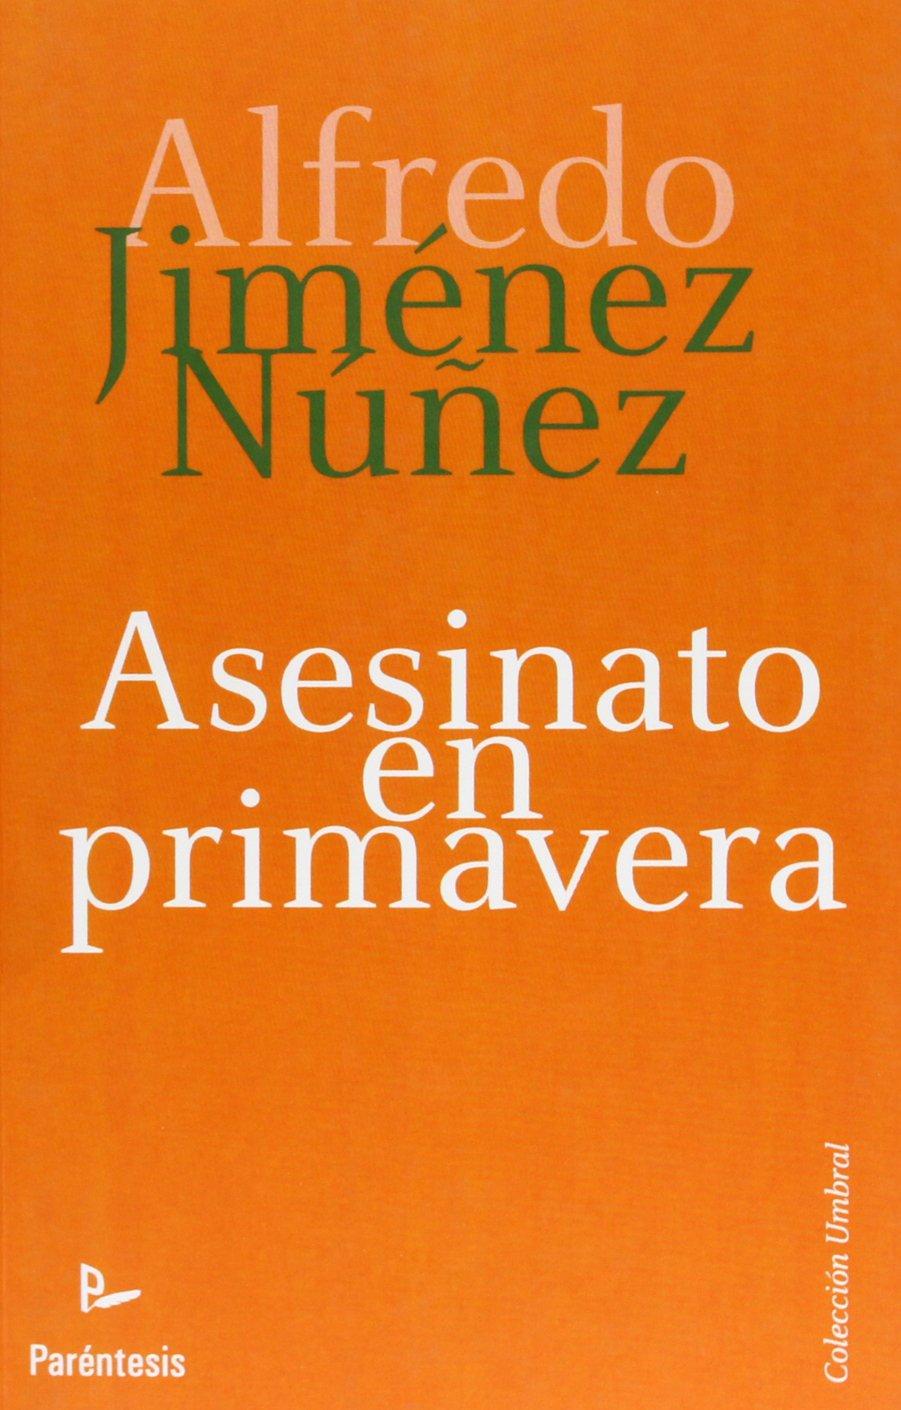 Asesinato En Primavera (Umbral (parentesis)): Amazon.es: Jiménez Núñez Alfredo: Libros